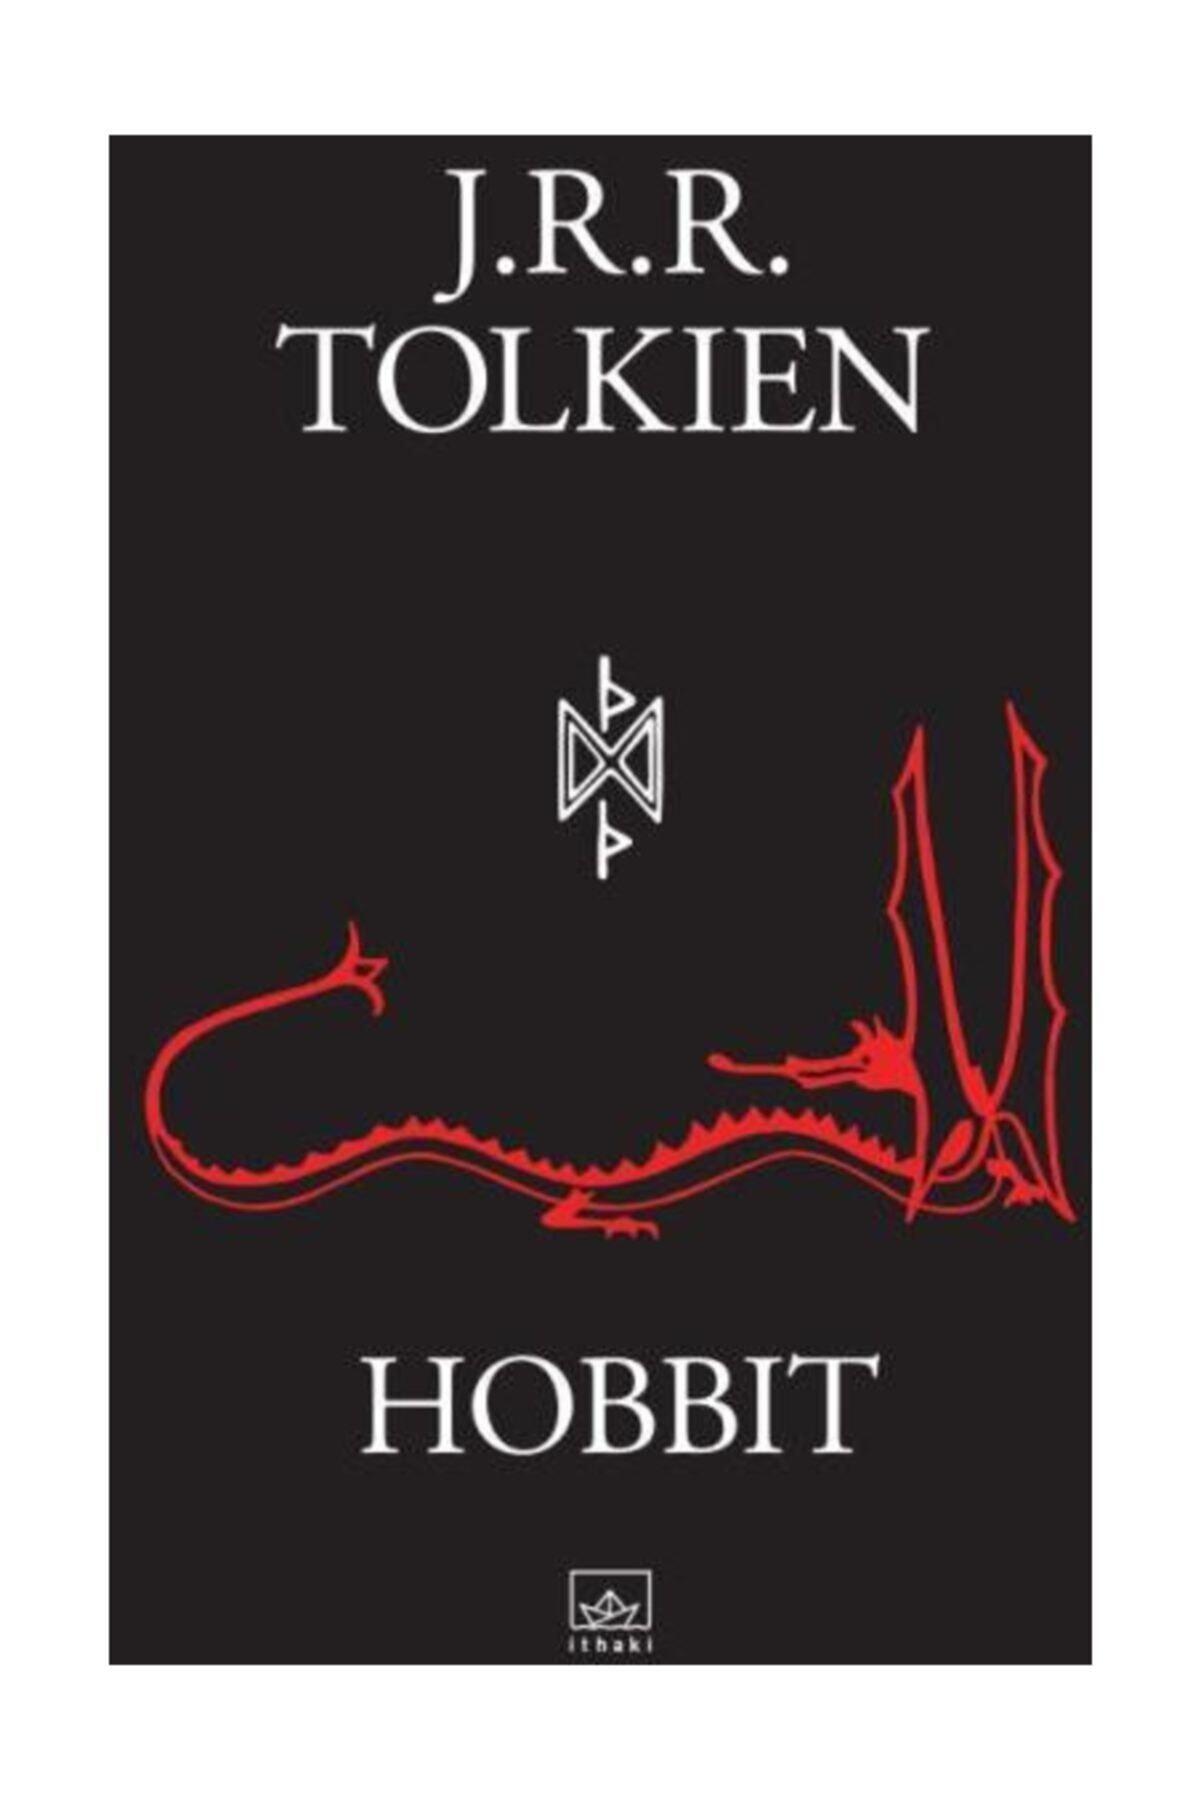 İthaki Yayınları Hobbit - J. R. R. Tolkien 1